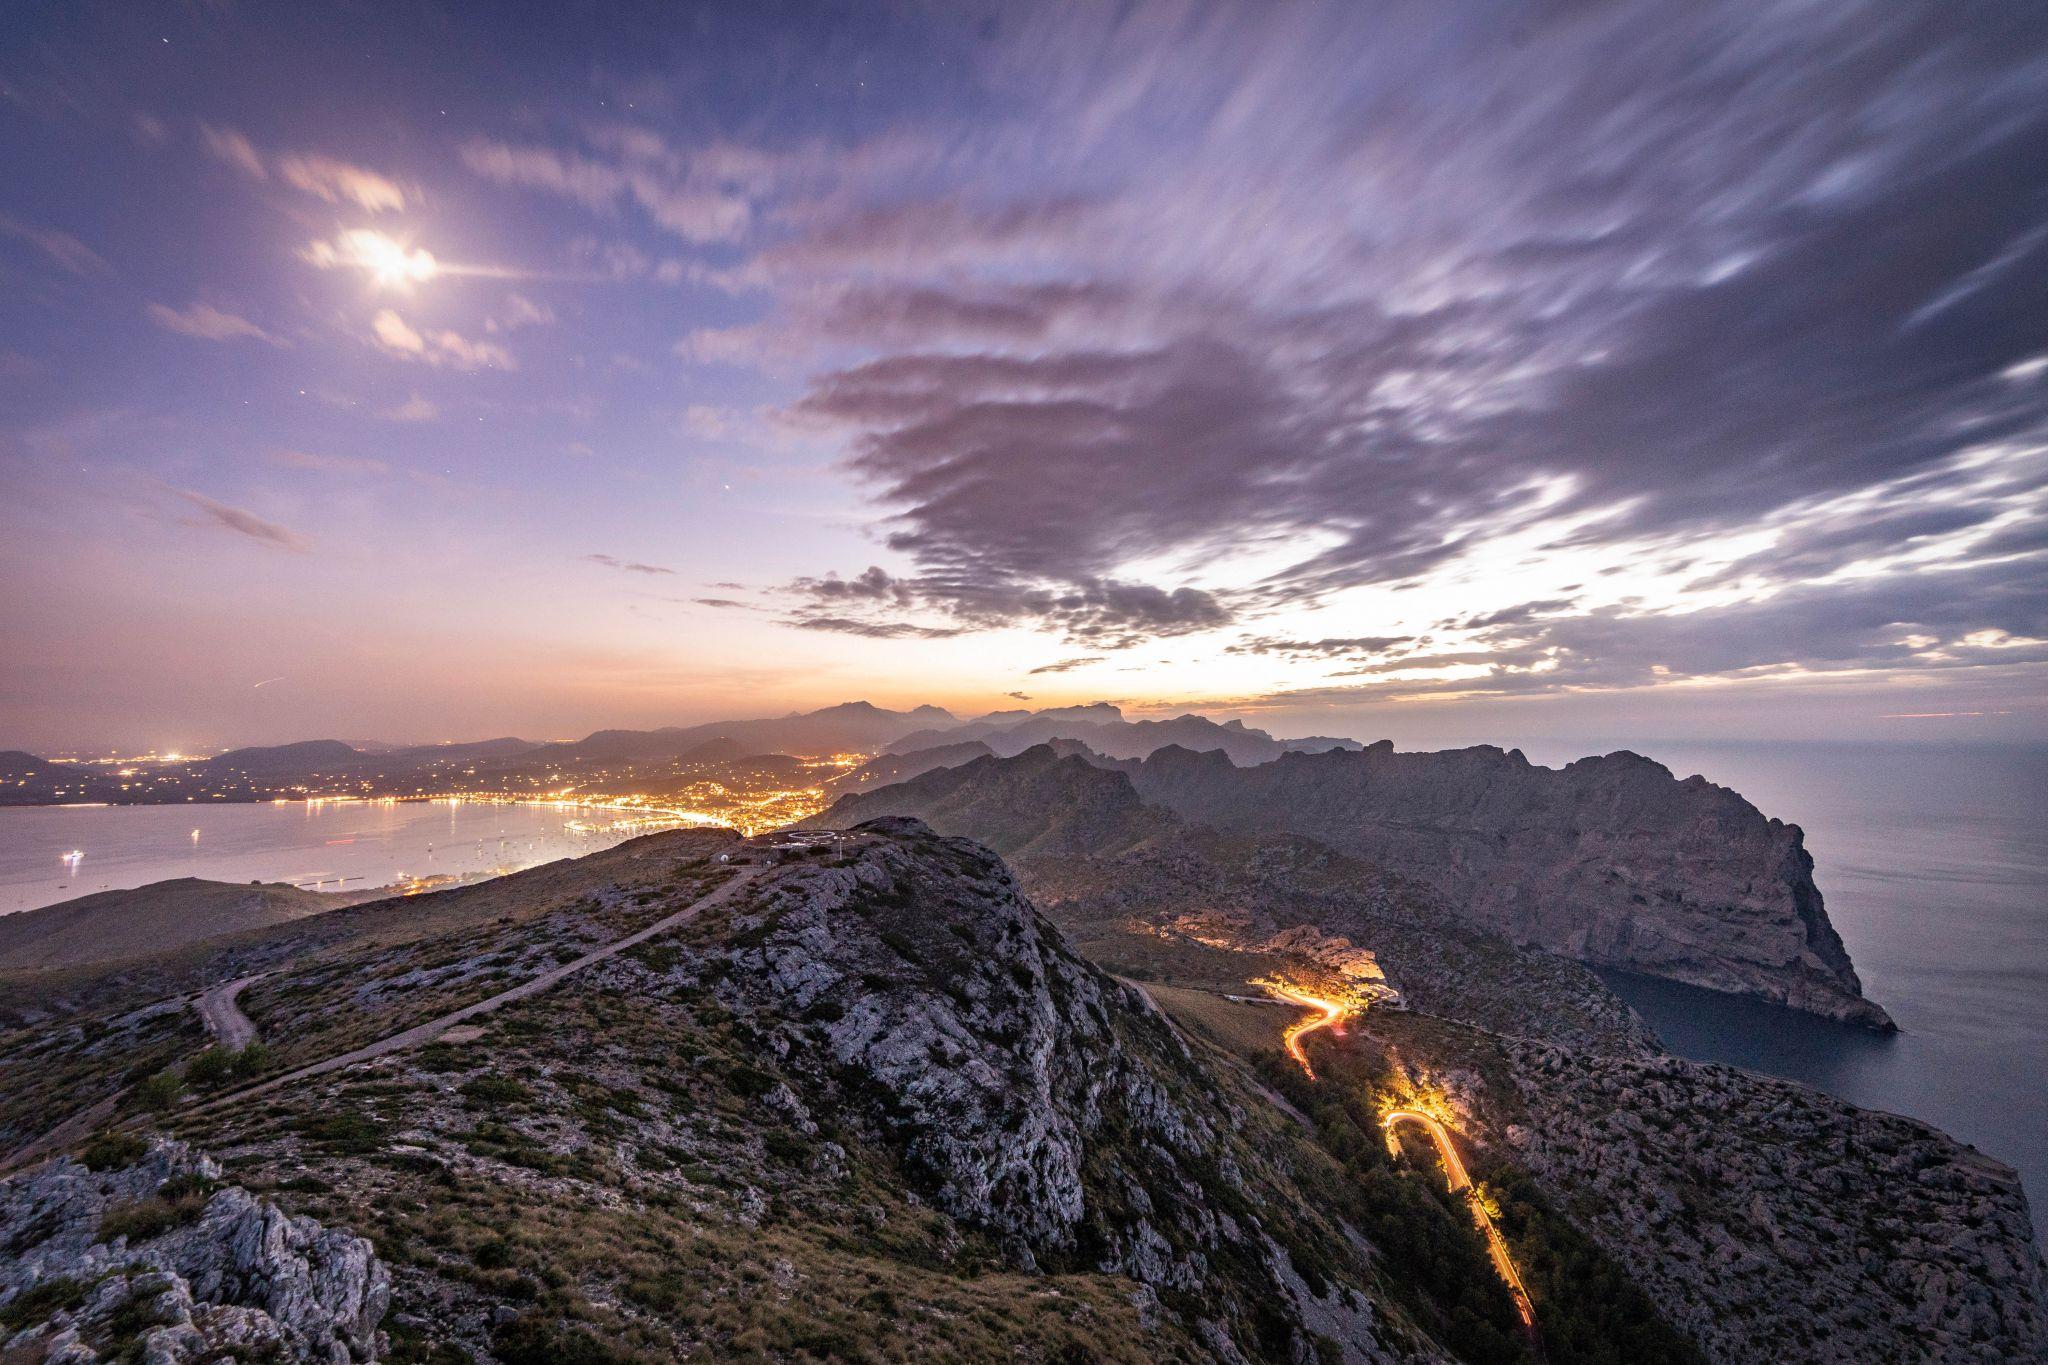 Albercutx Watchtower View, Spain